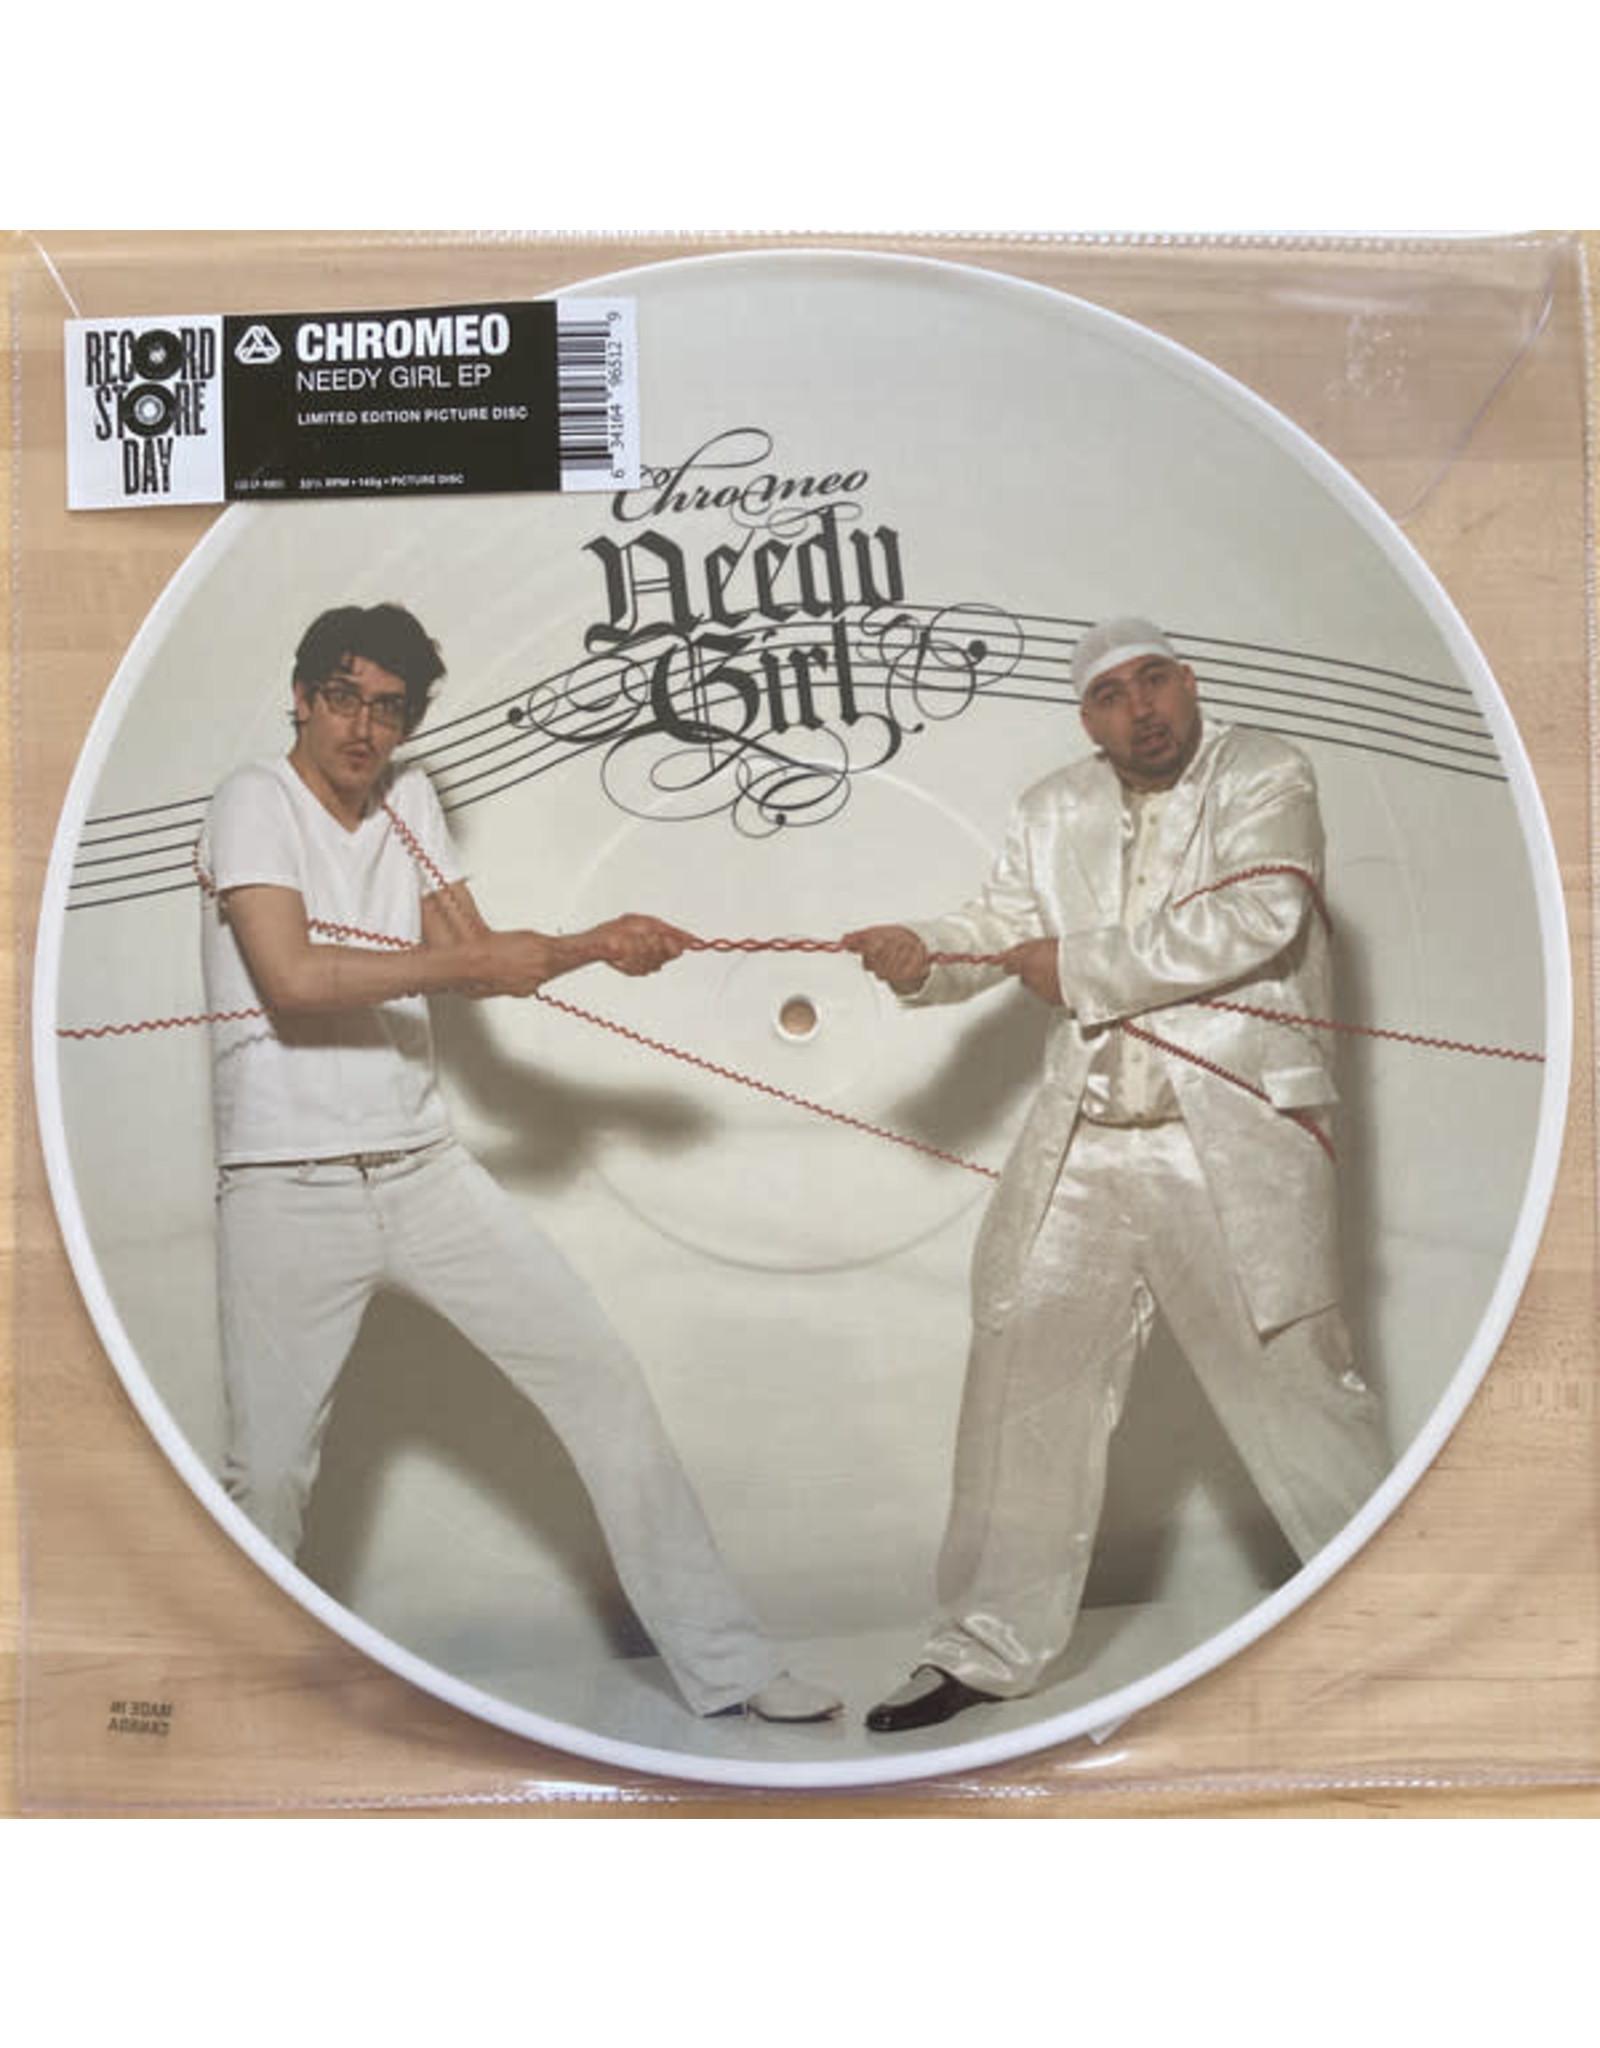 Chromeo - Needy Girl EP (2020RSD Picture Disc) LP